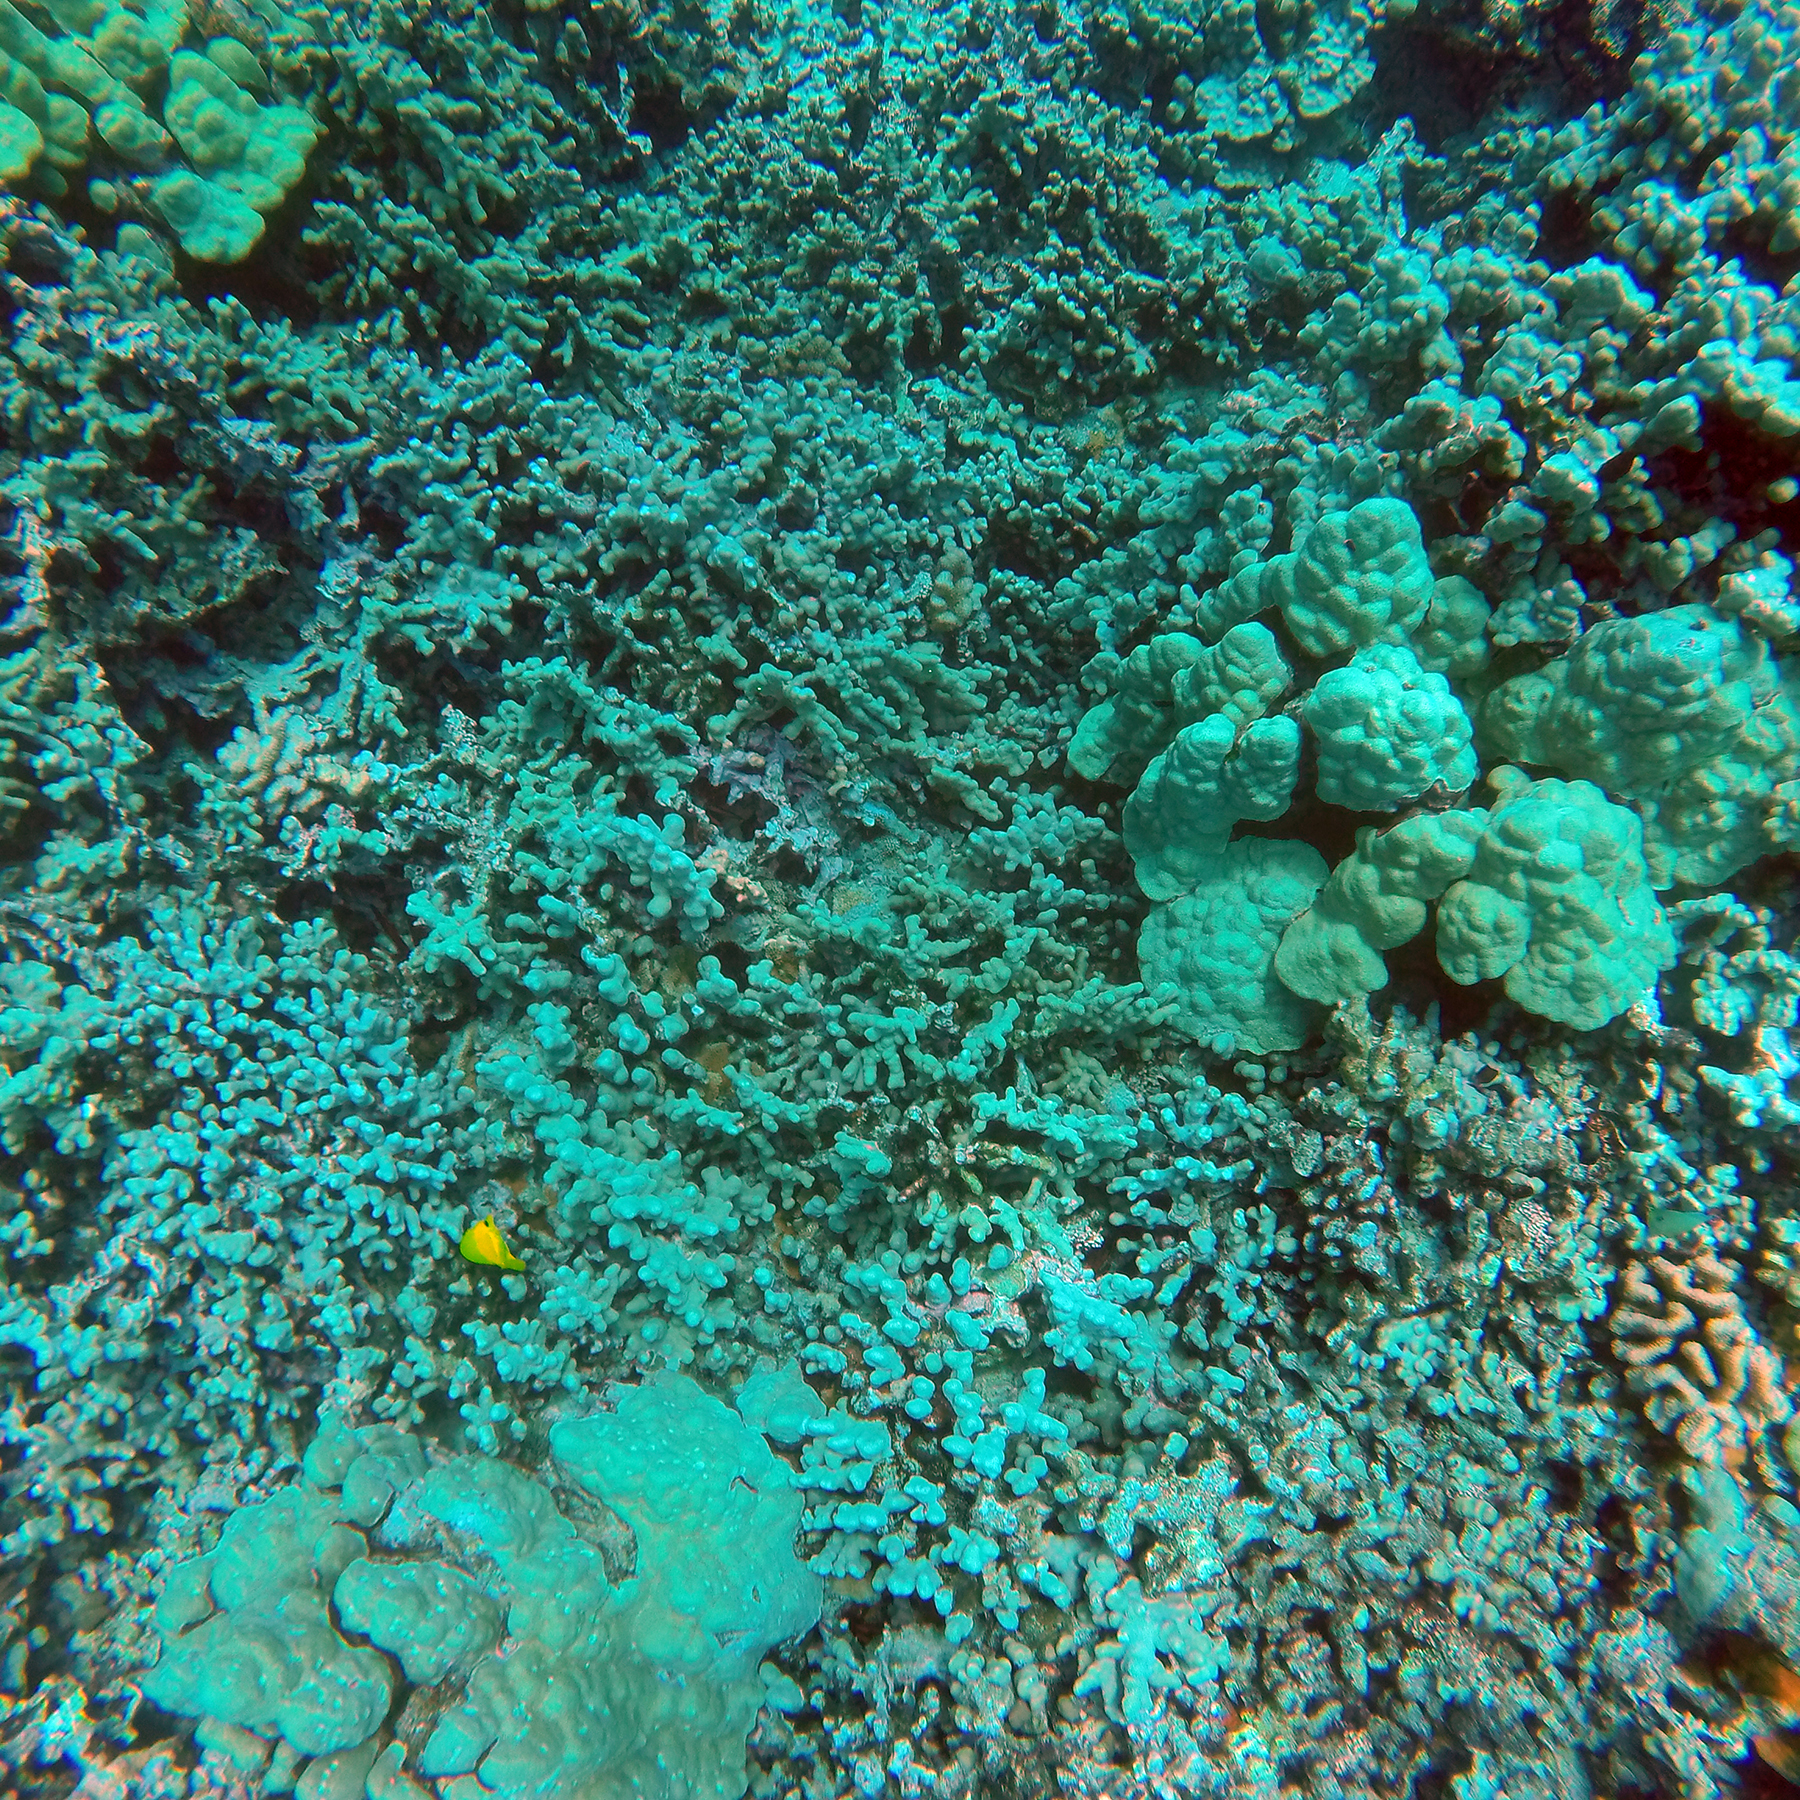 NOAA Pacific Islands Fisheries Science Center Blog